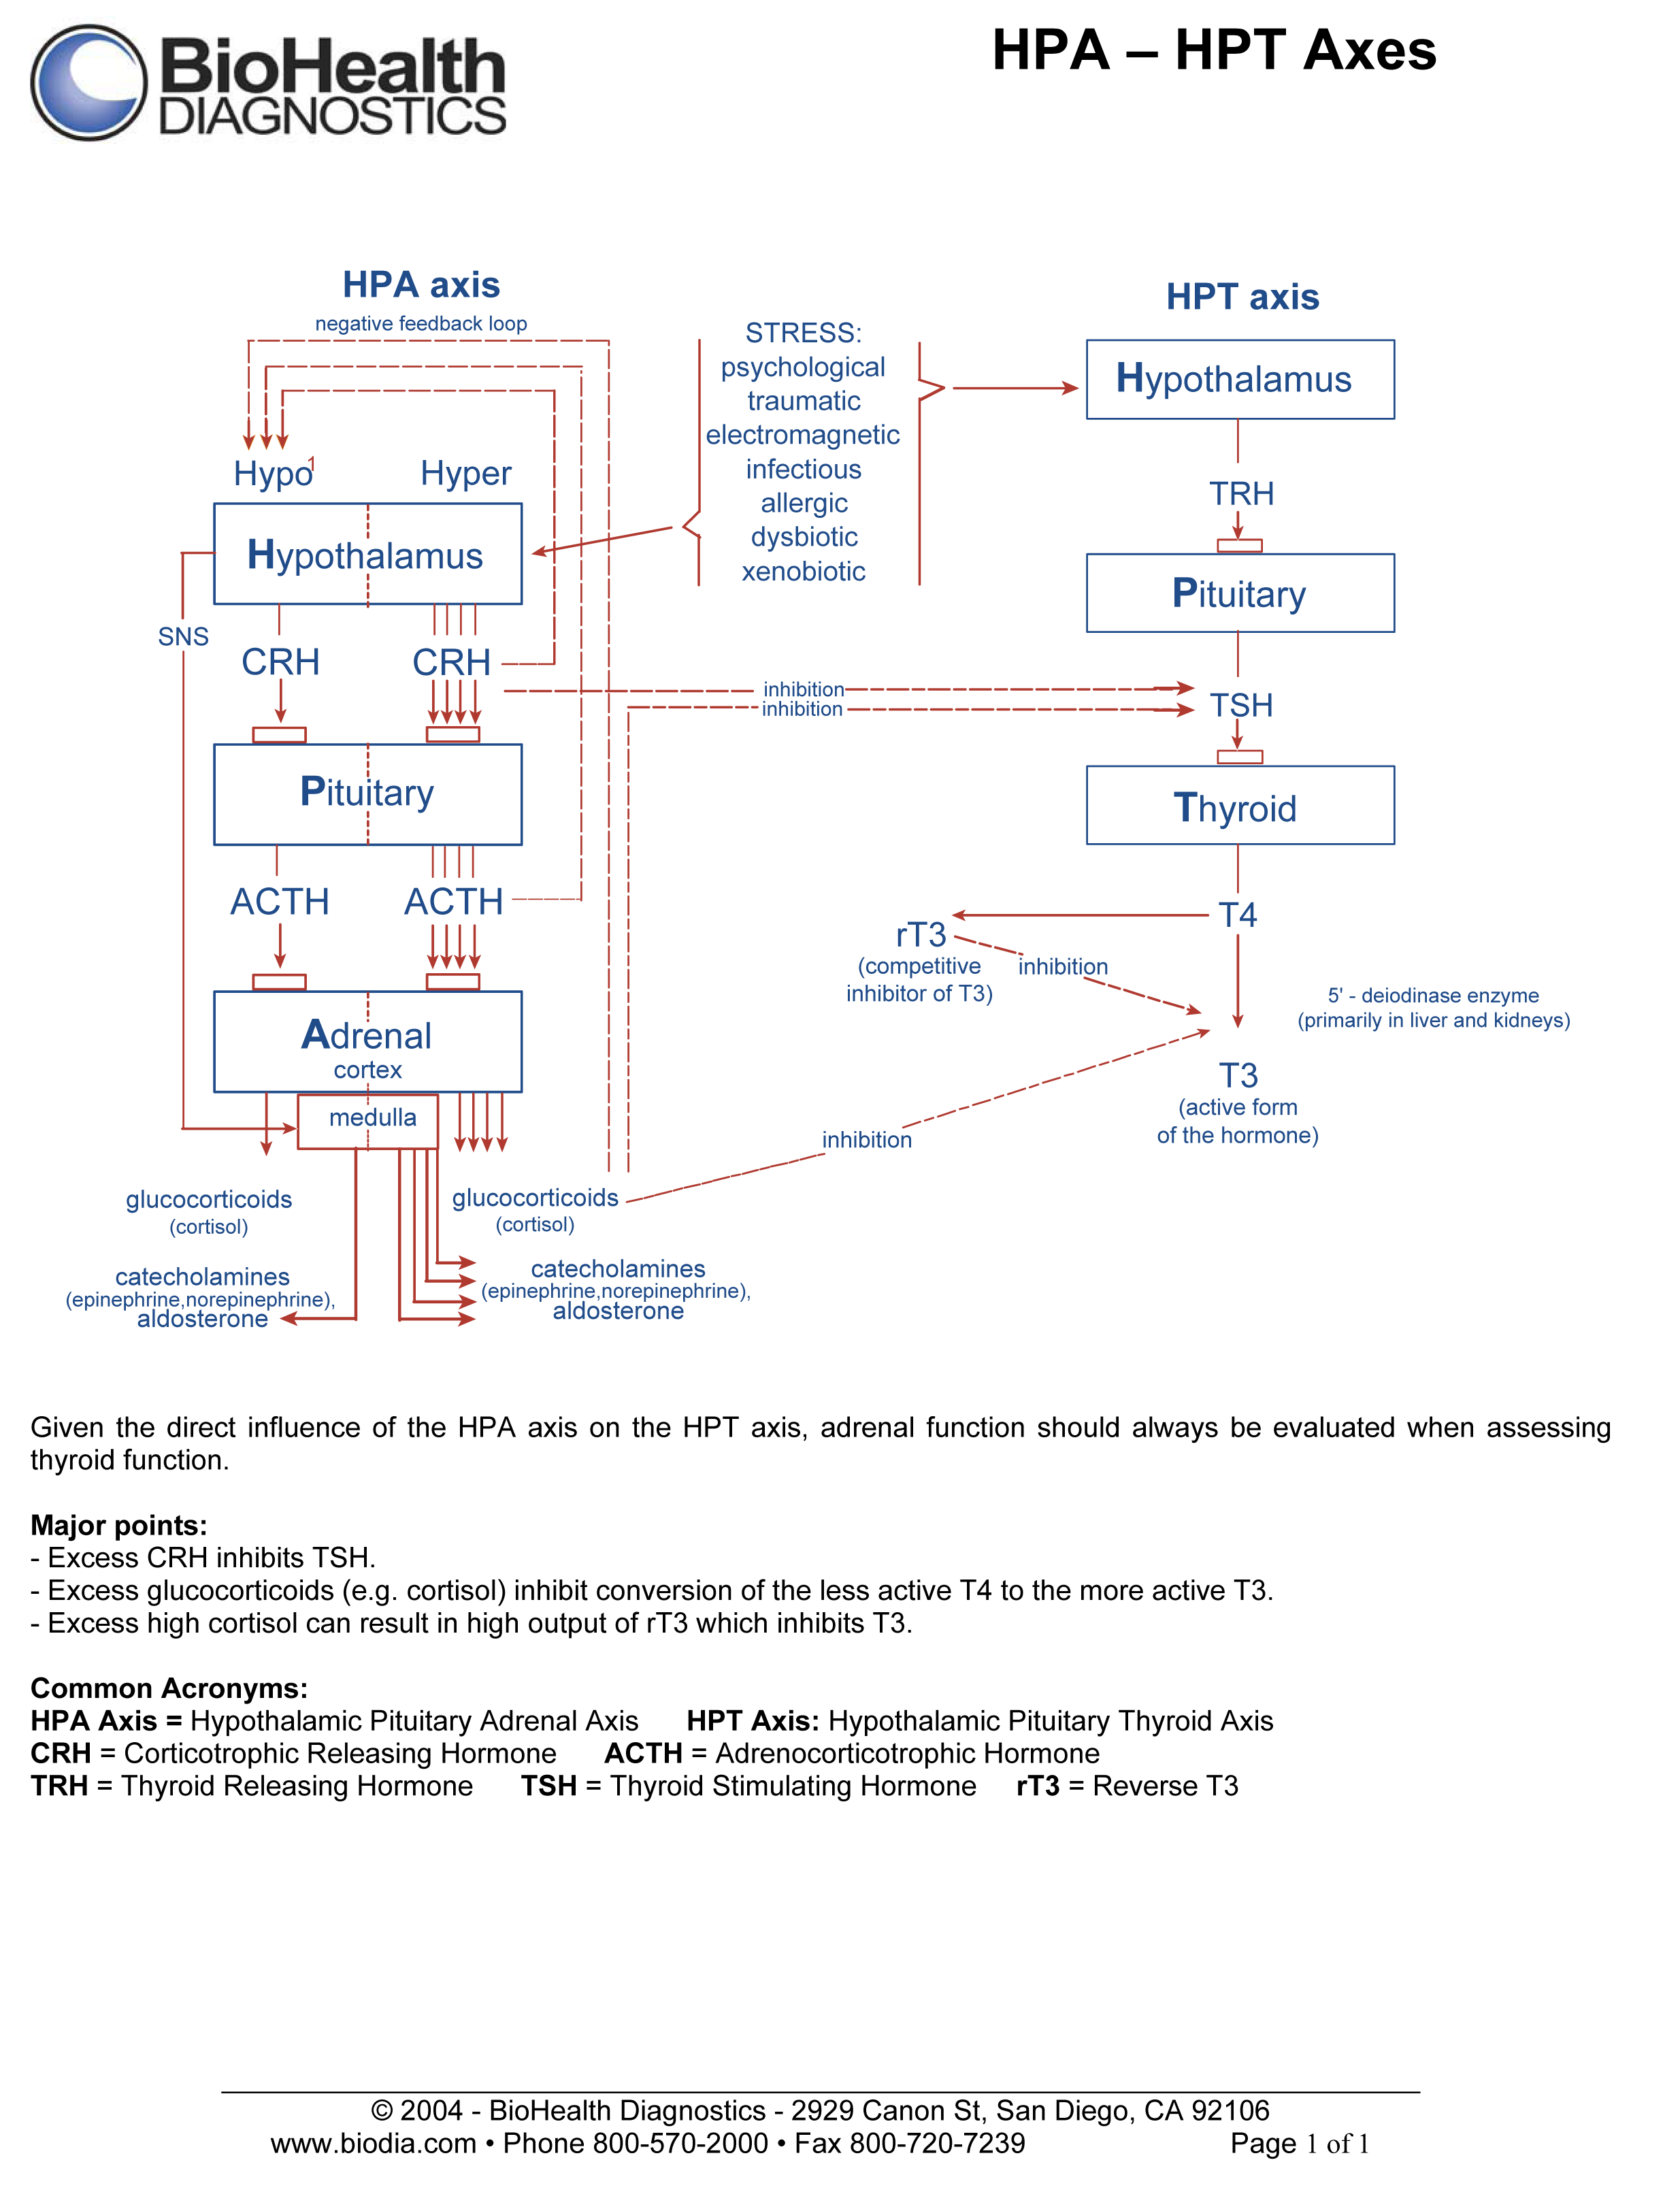 http://www.advancedhealing.com/wp-content/uploads/2012/07/hpa_hpt_axis_chart.pdf